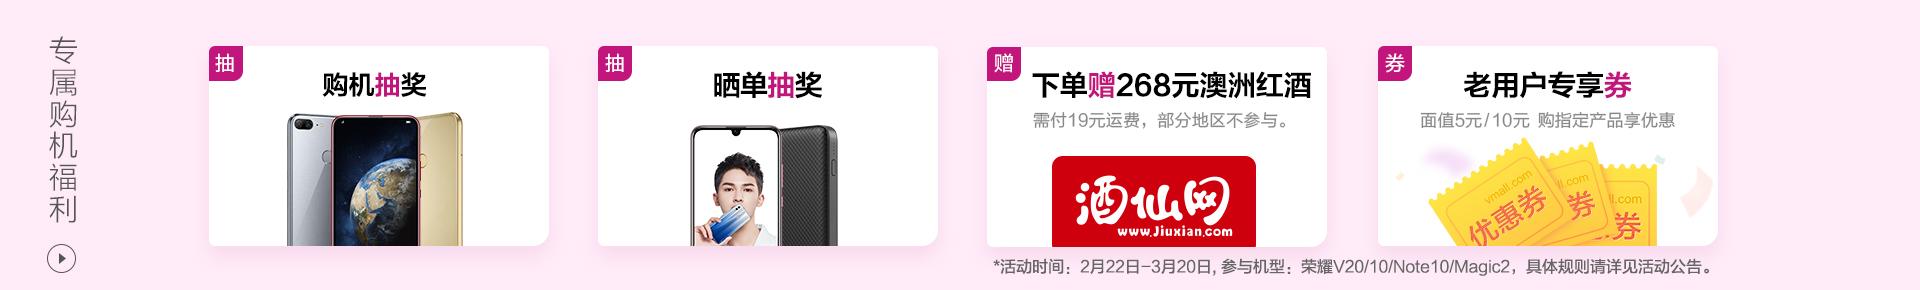 旗舰机banner图.jpg